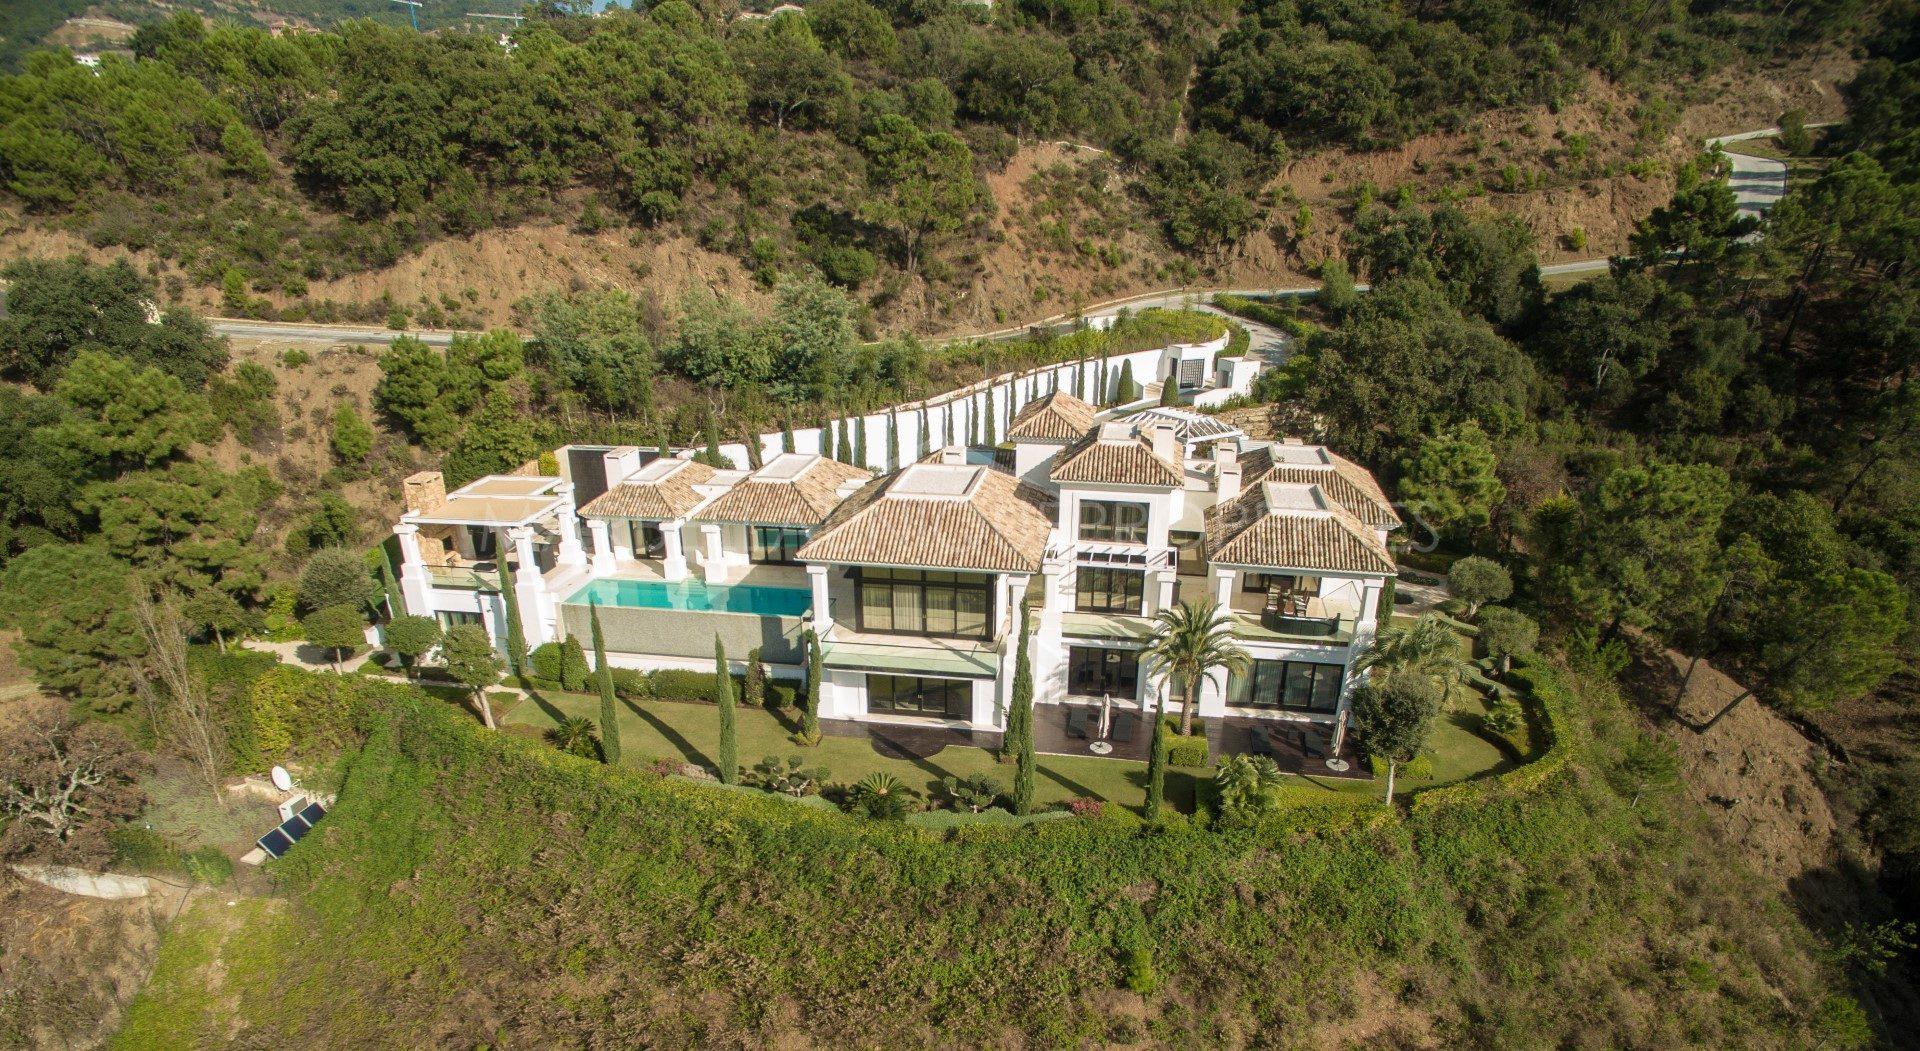 The Best Properties in La Zagaleta - Marbella Unique Properties - Modern contemporary style 5 bedroom villa built to the highest quality standards in La Zagaleta, 4.900.000€